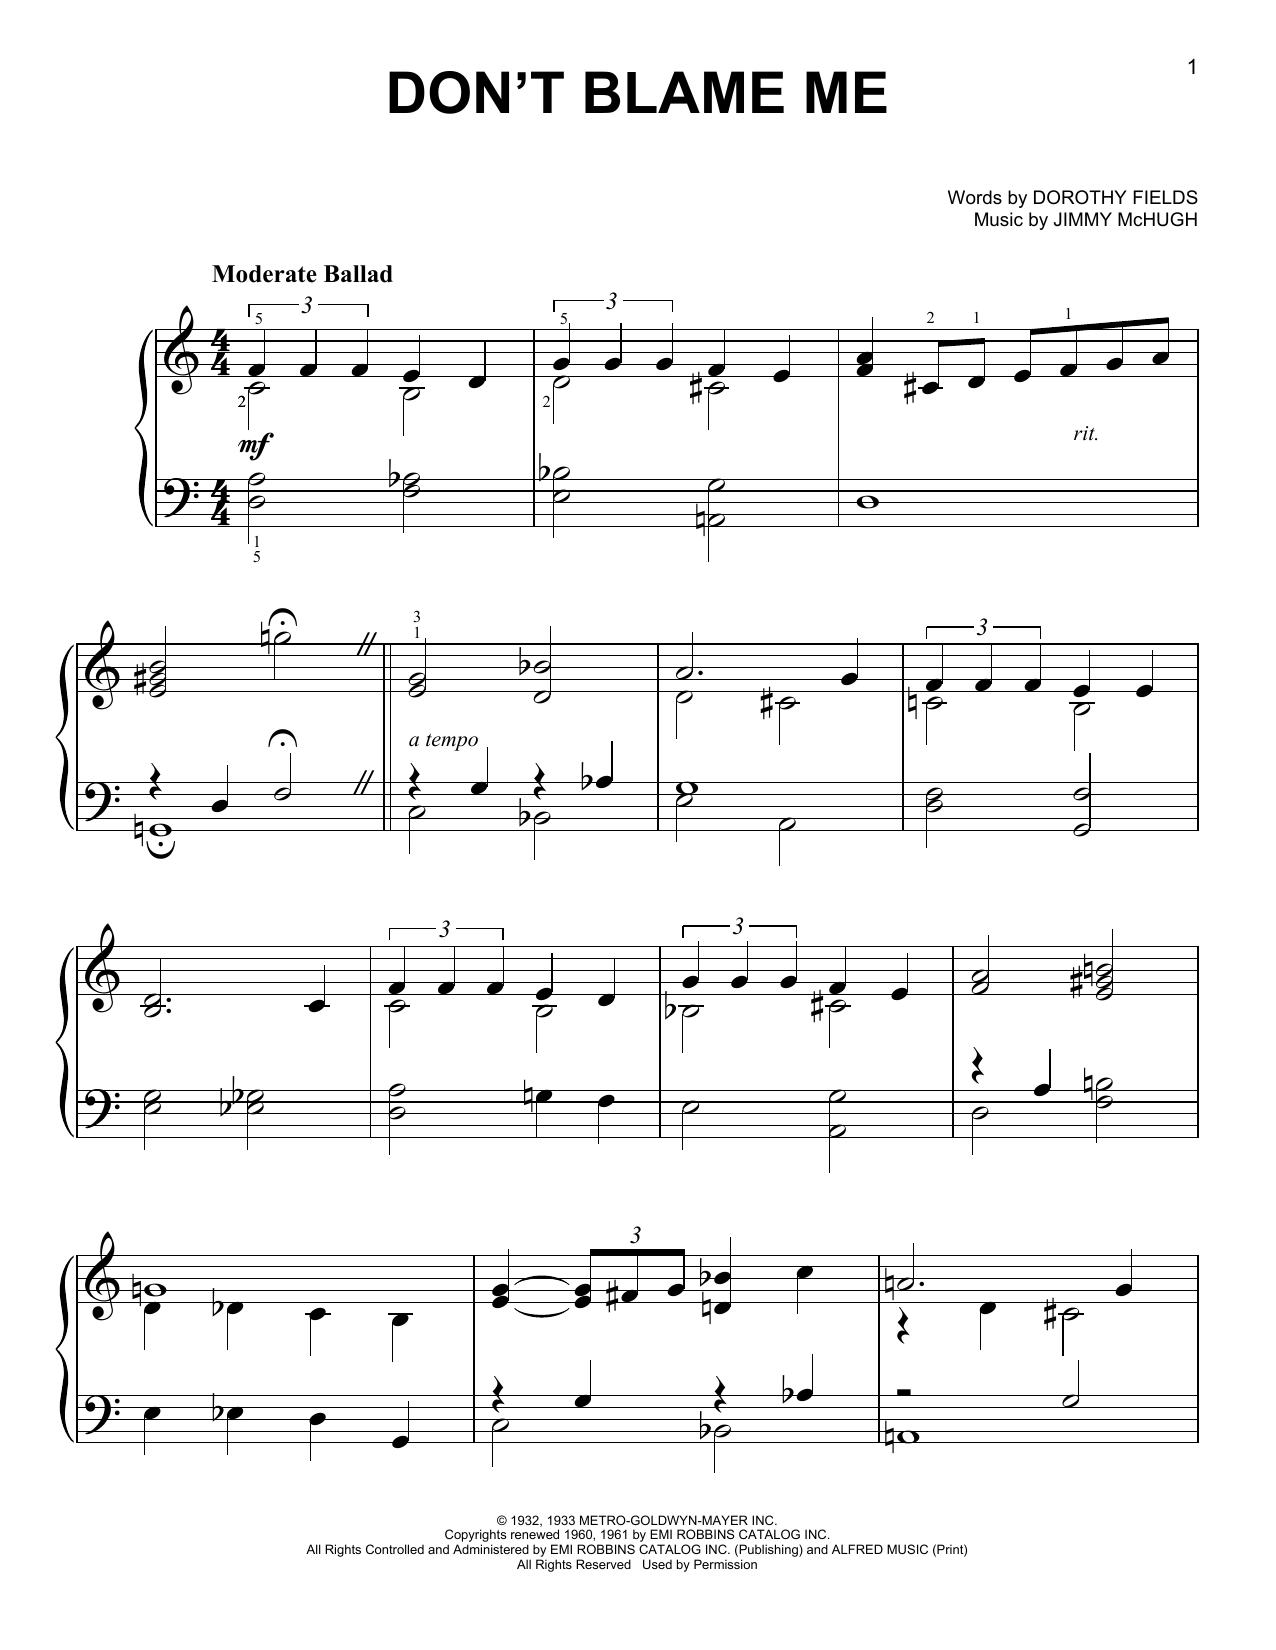 Jimmy McHugh Don't Blame Me sheet music notes and chords. Download Printable PDF.